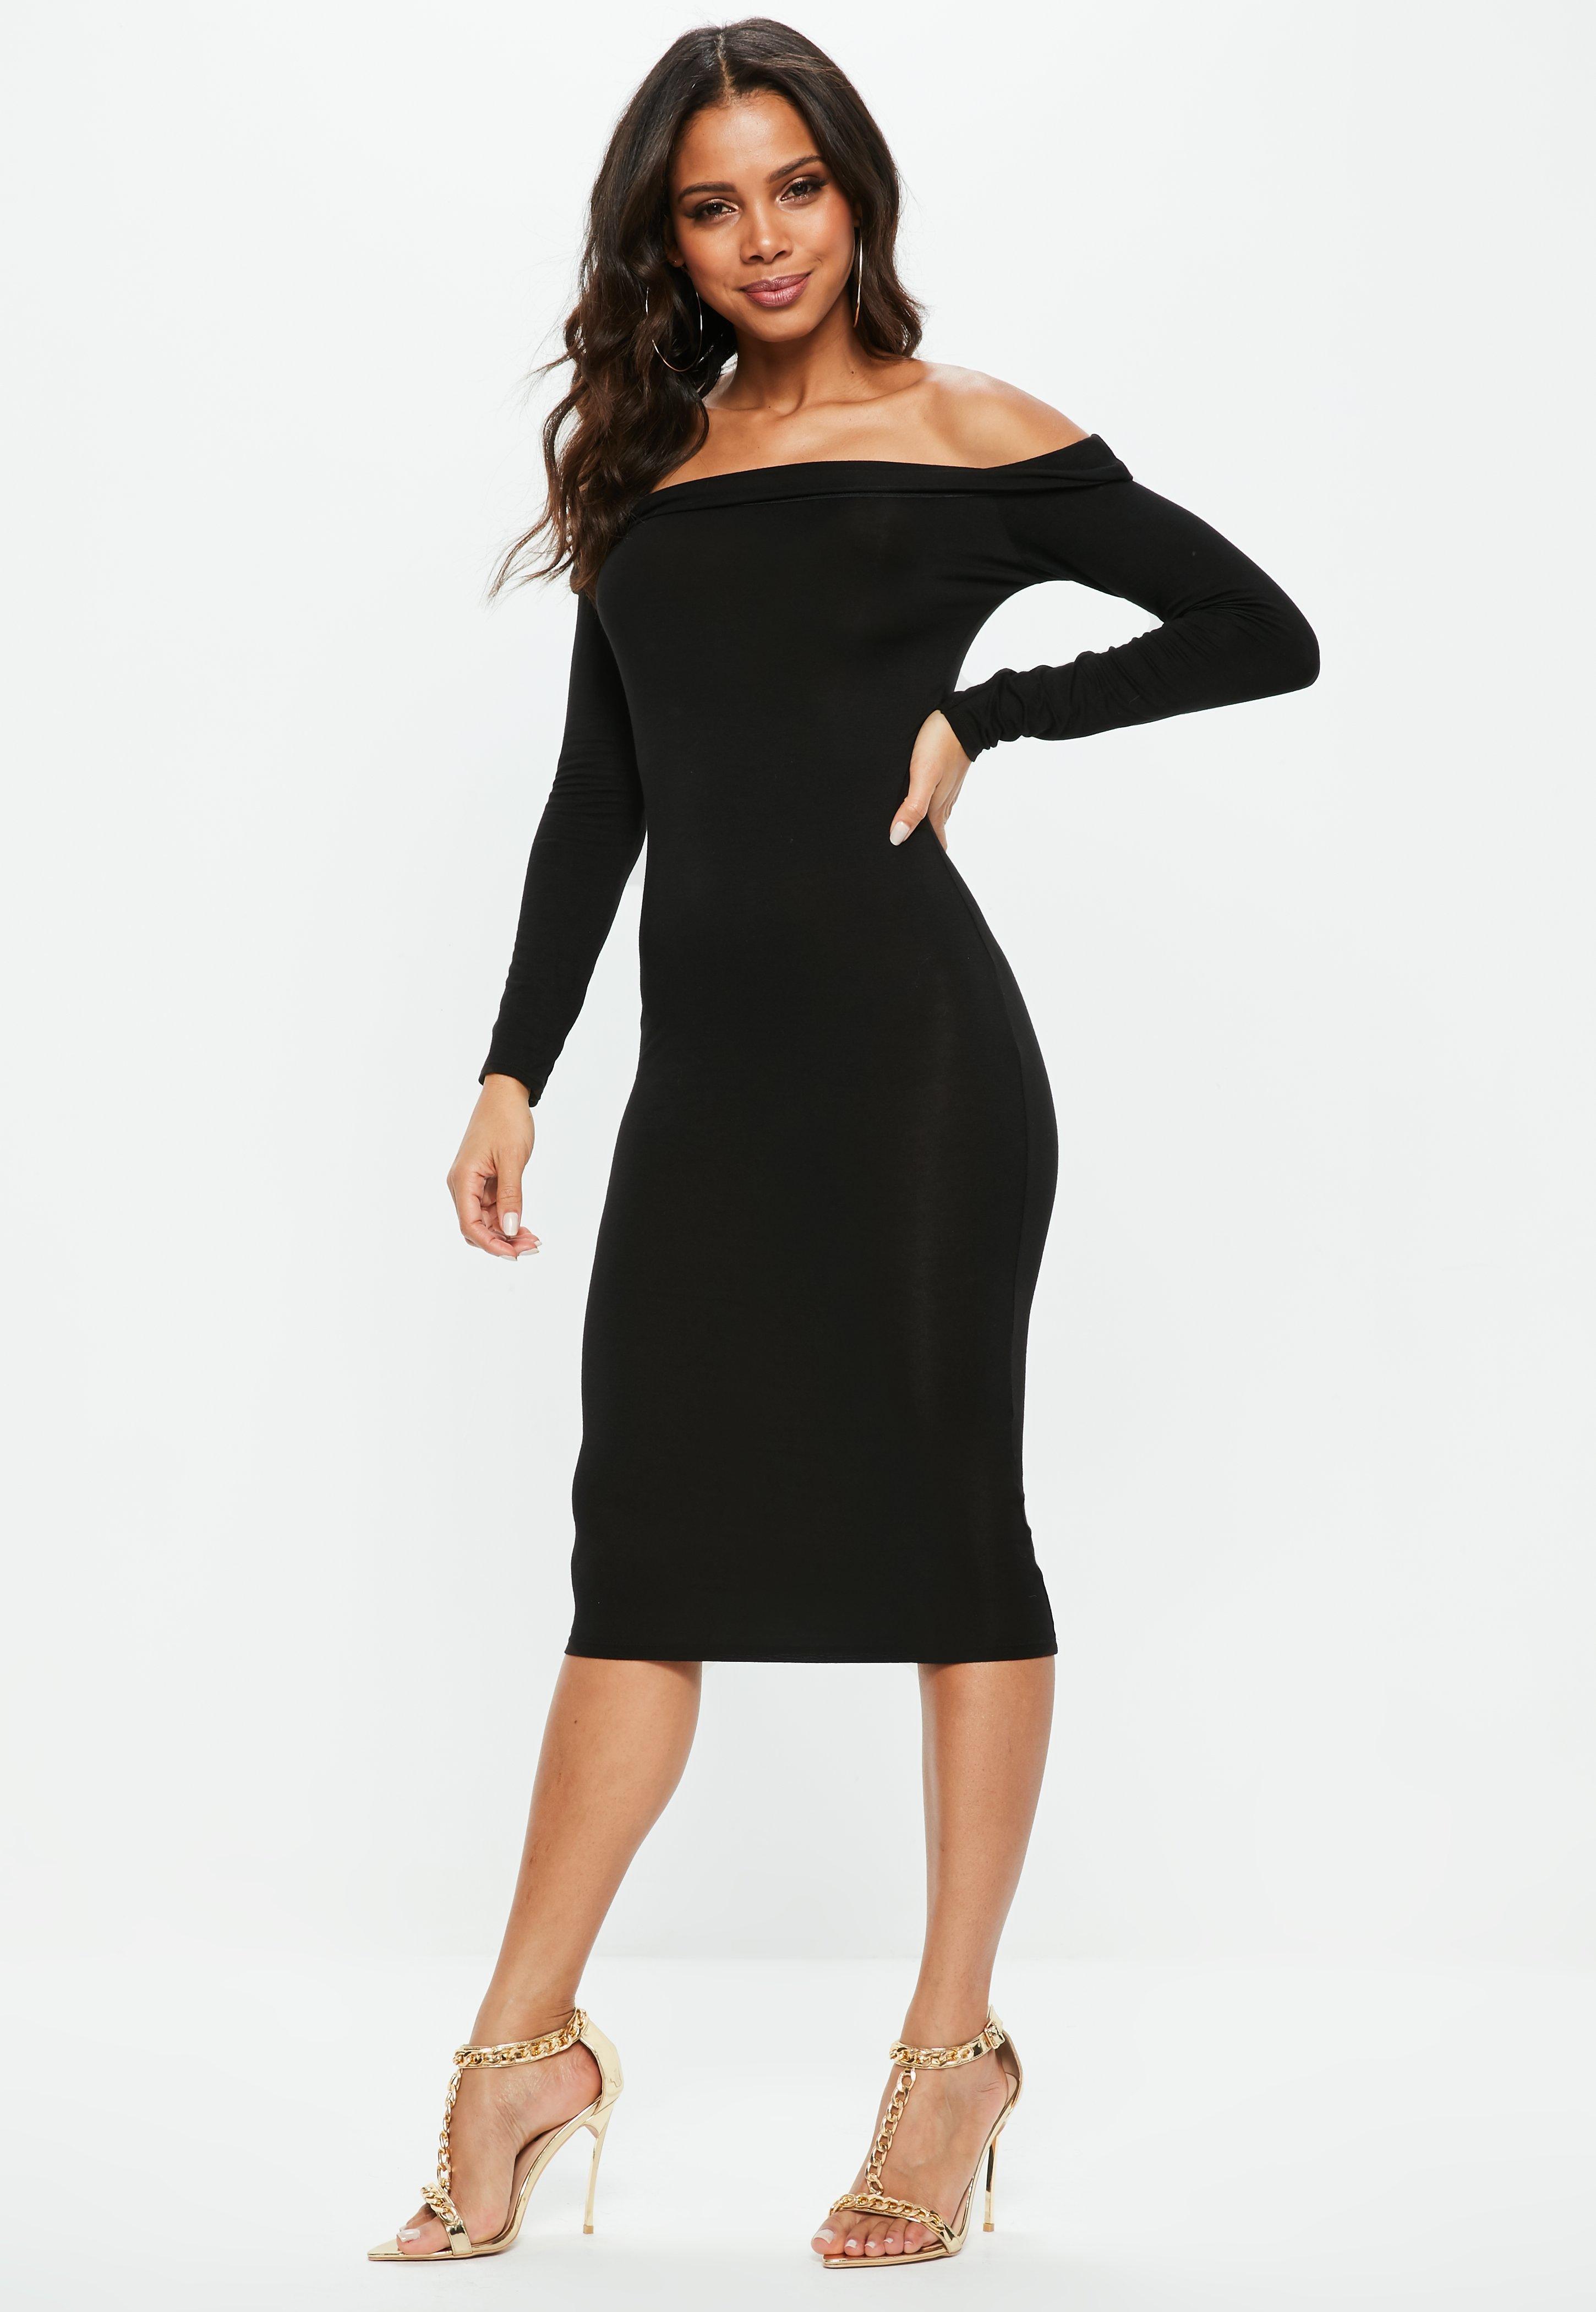 Midi Bodycon Dresses